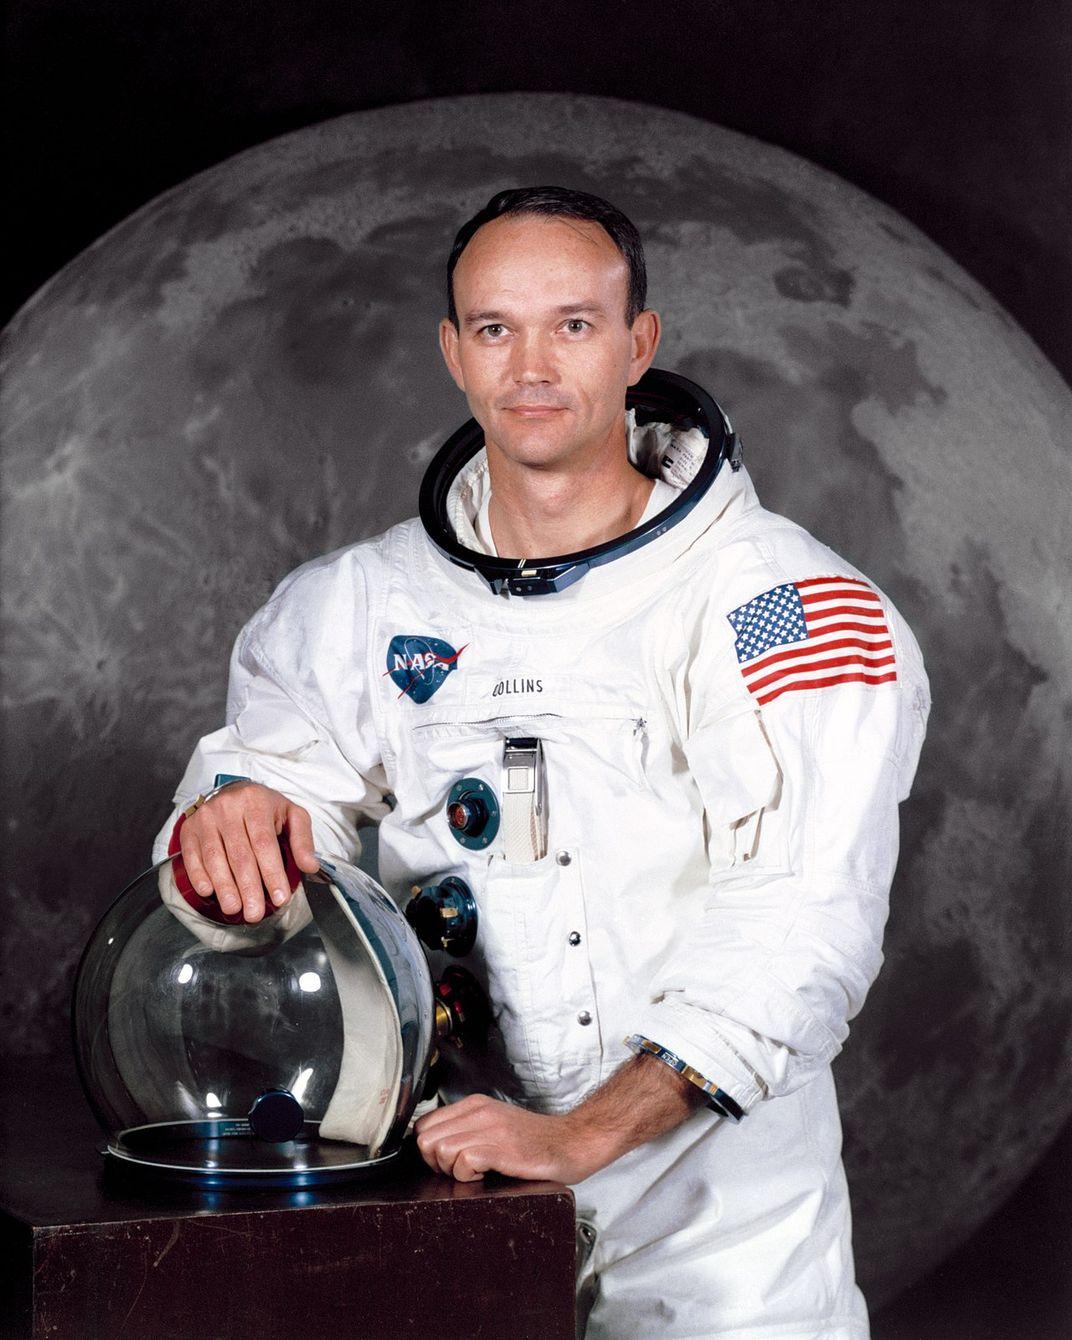 Michael Collins in spacesuit